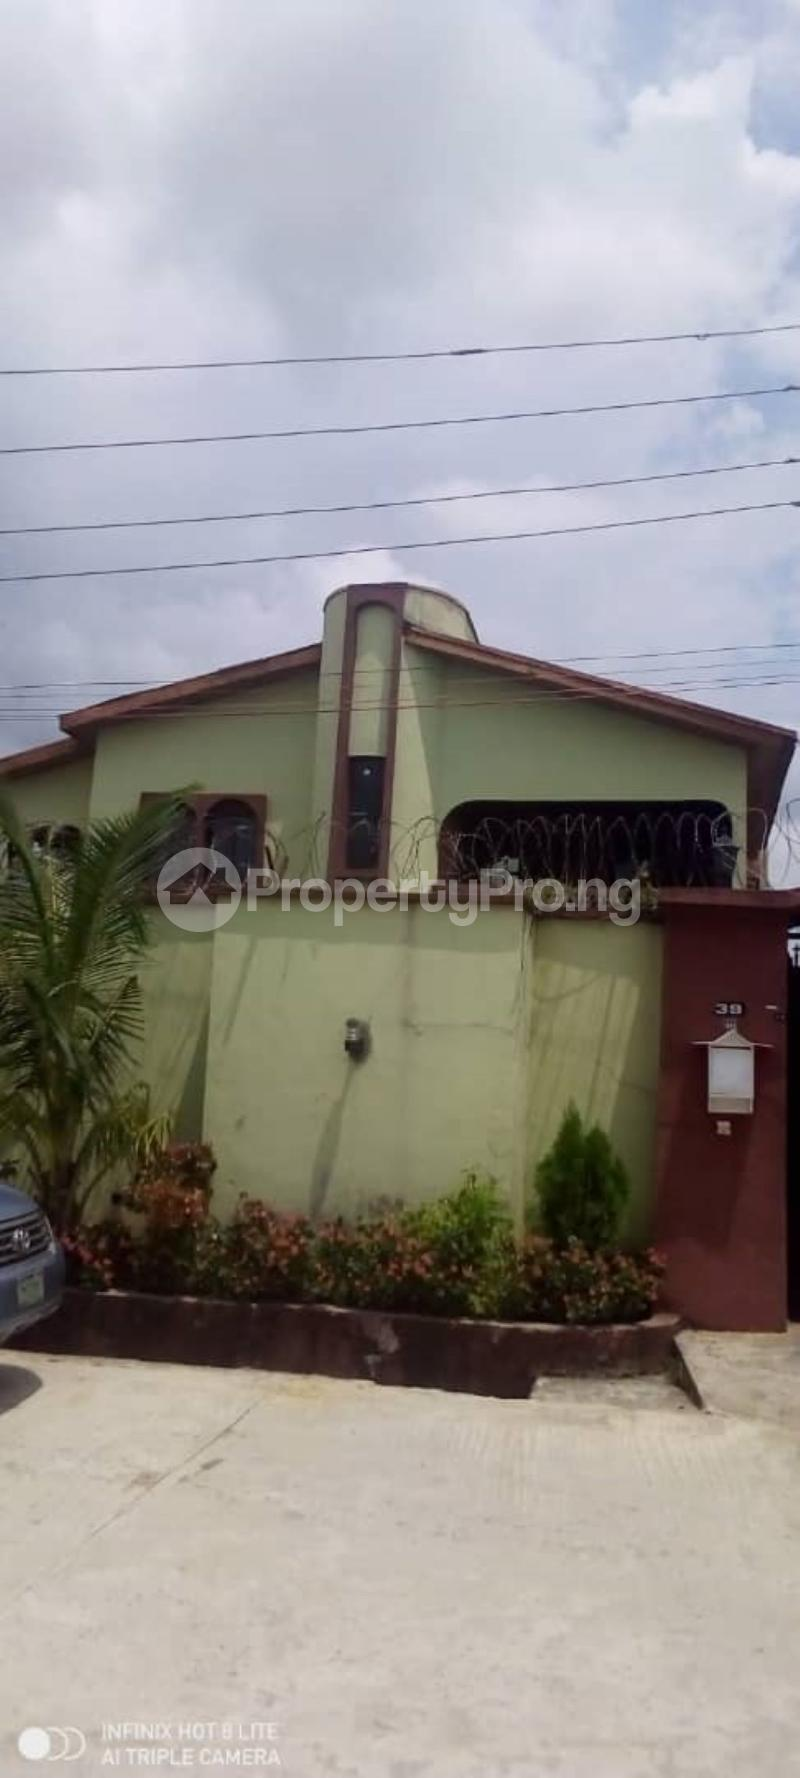 6 bedroom Terraced Duplex for sale Estate Medina Gbagada Lagos - 1